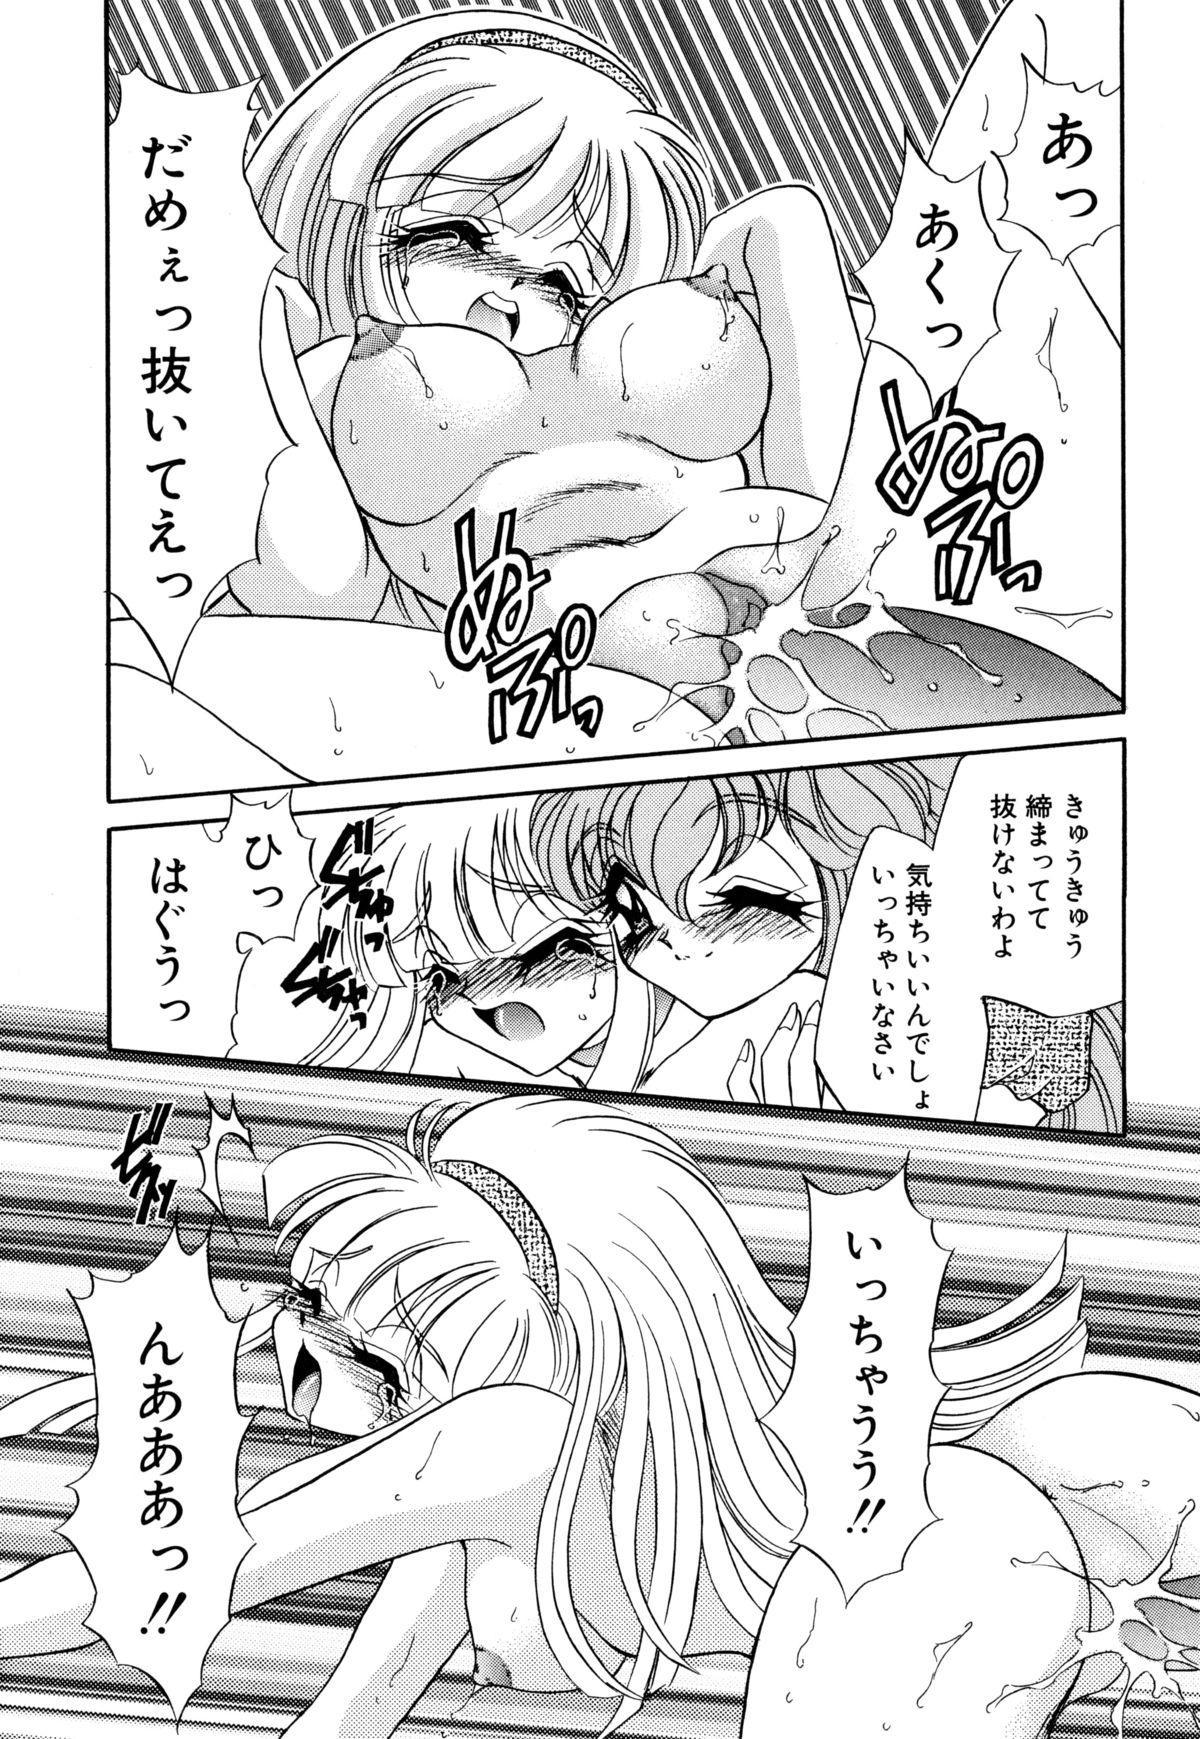 Kigurumi Sentai Quiltian 54